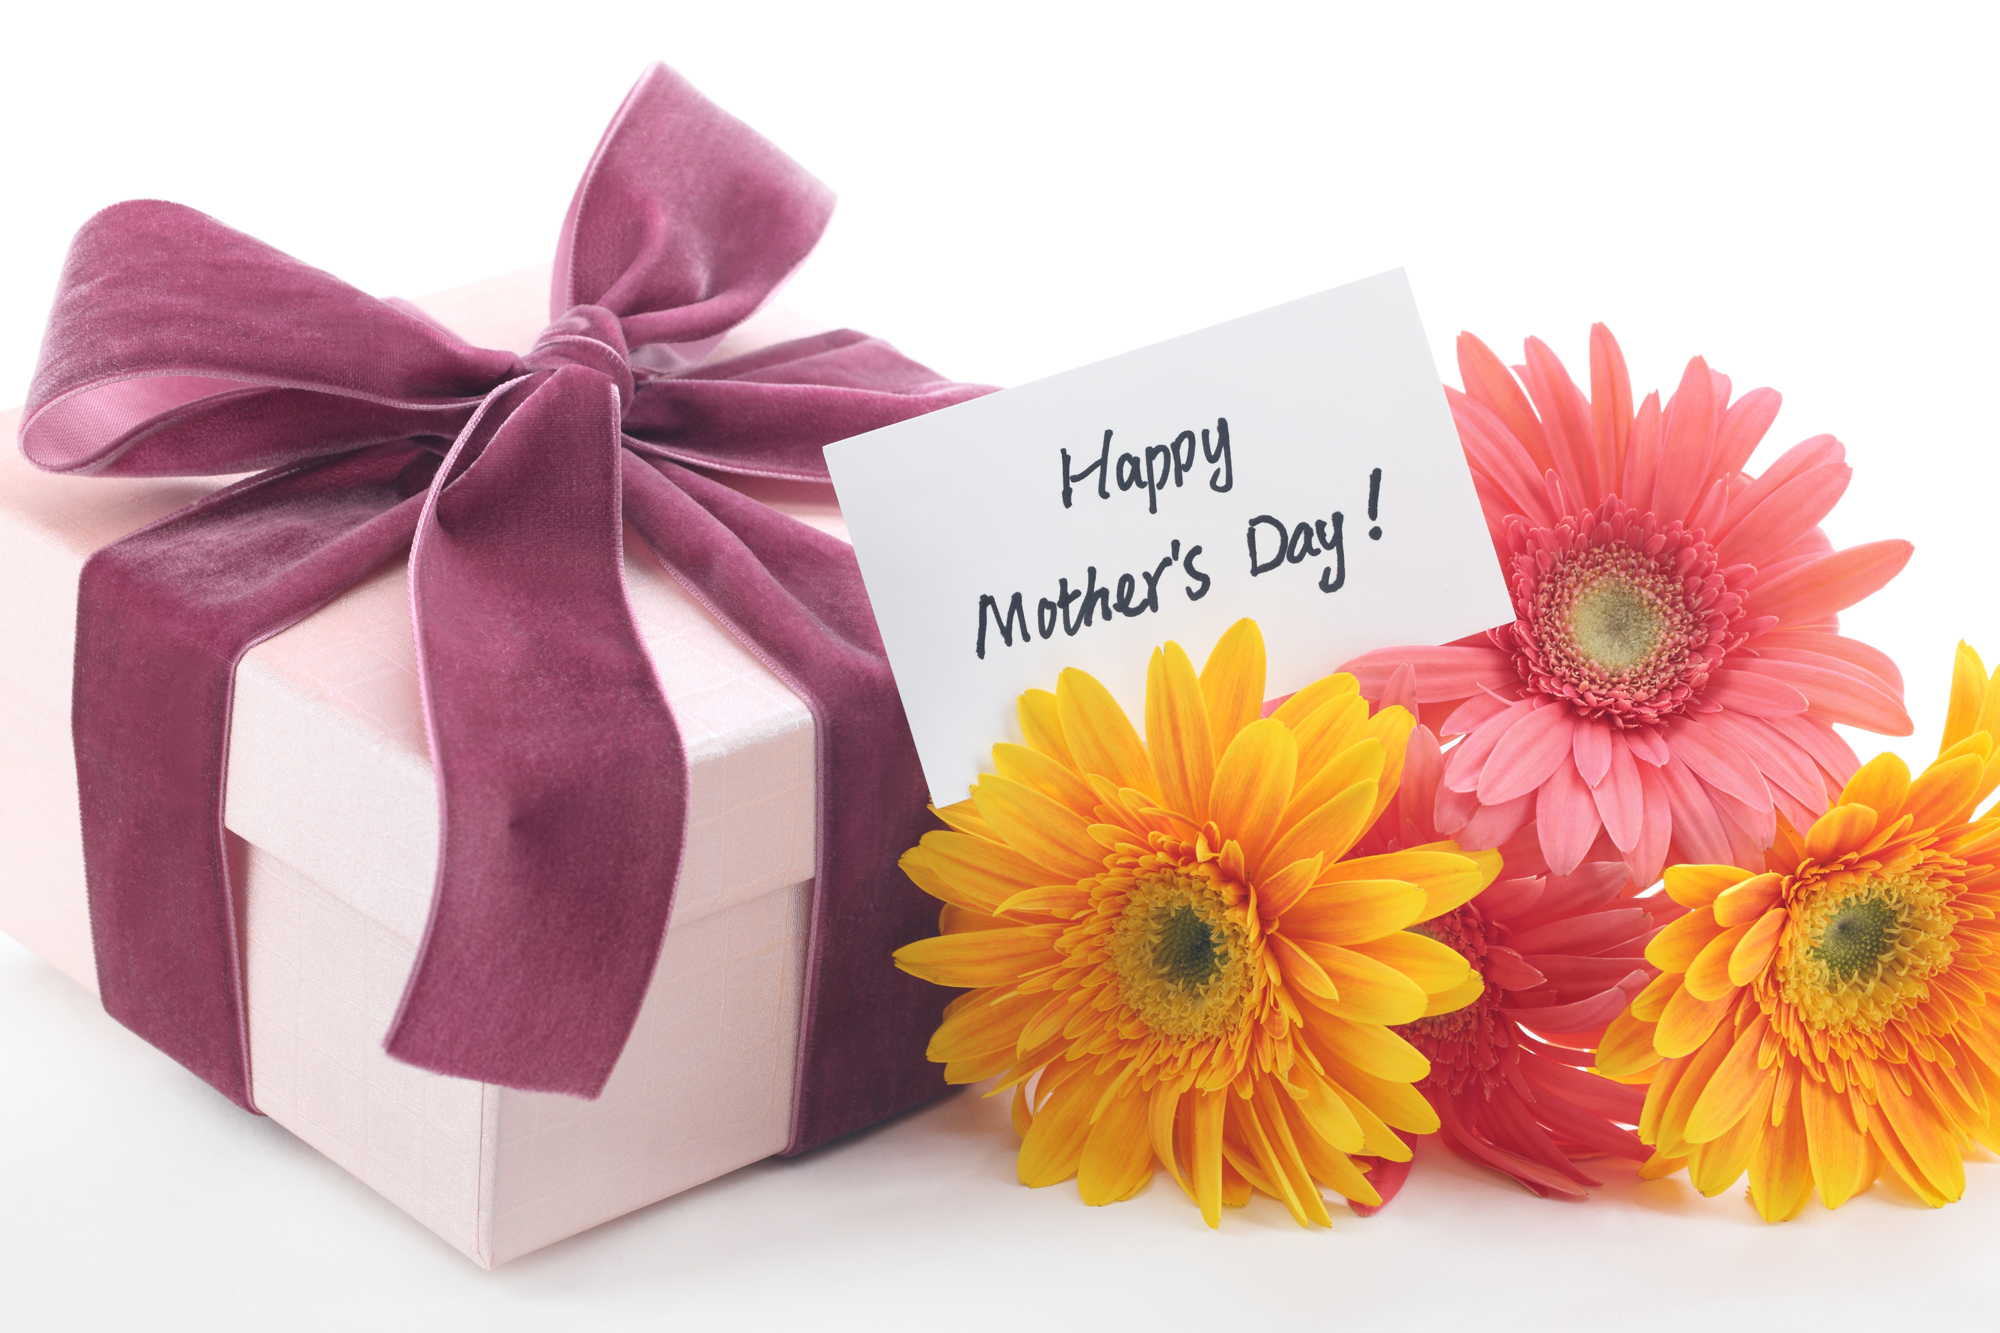 Happy Mothers Day Gift - Happy Mothers Day Gift